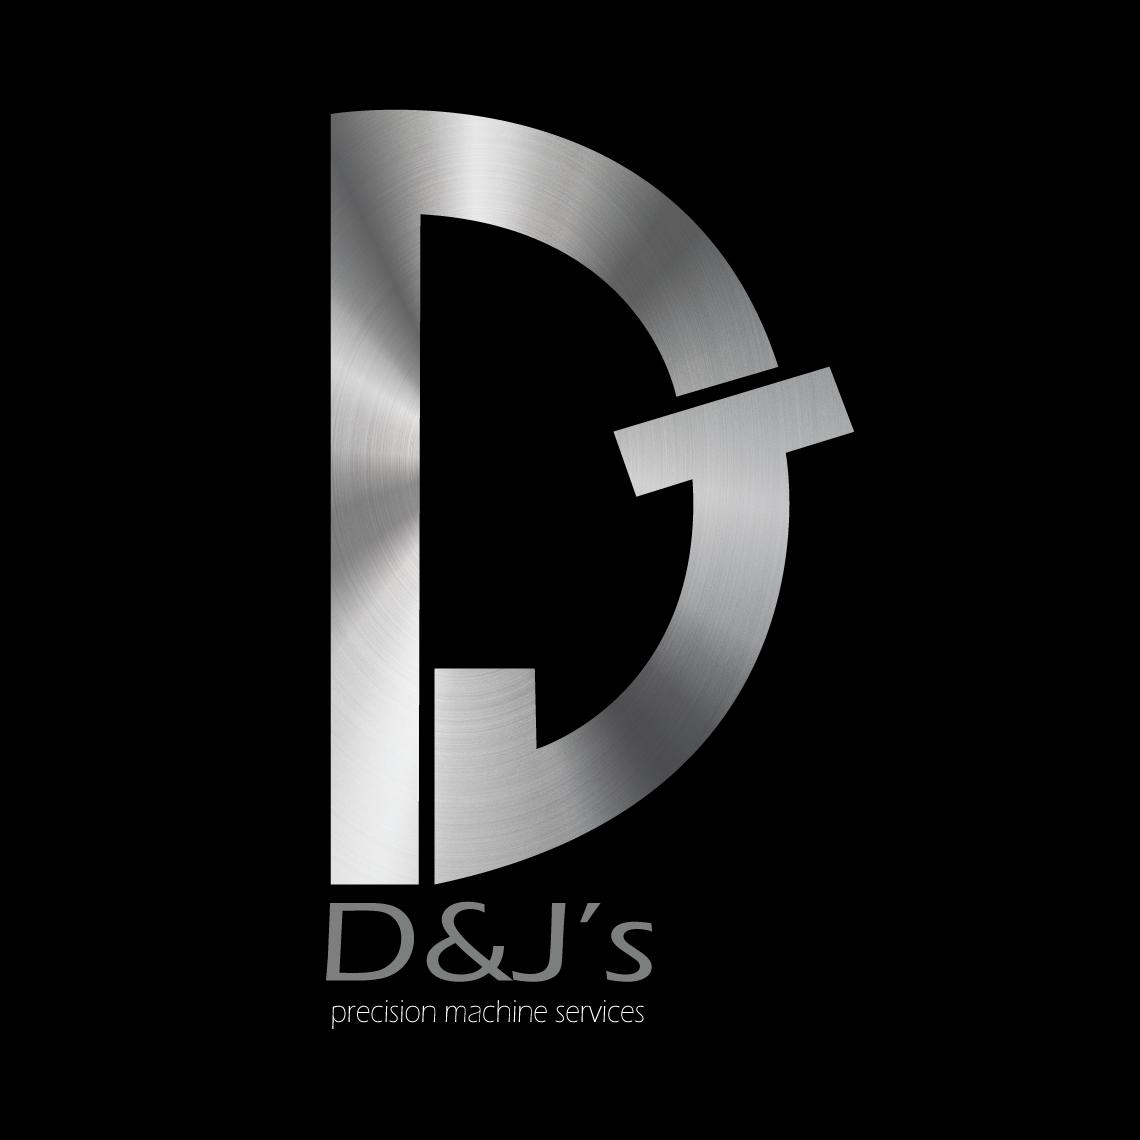 Logo Design by Safal Adam - Entry No. 110 in the Logo Design Contest Creative Logo Design for D & J's Precision Machine Services.